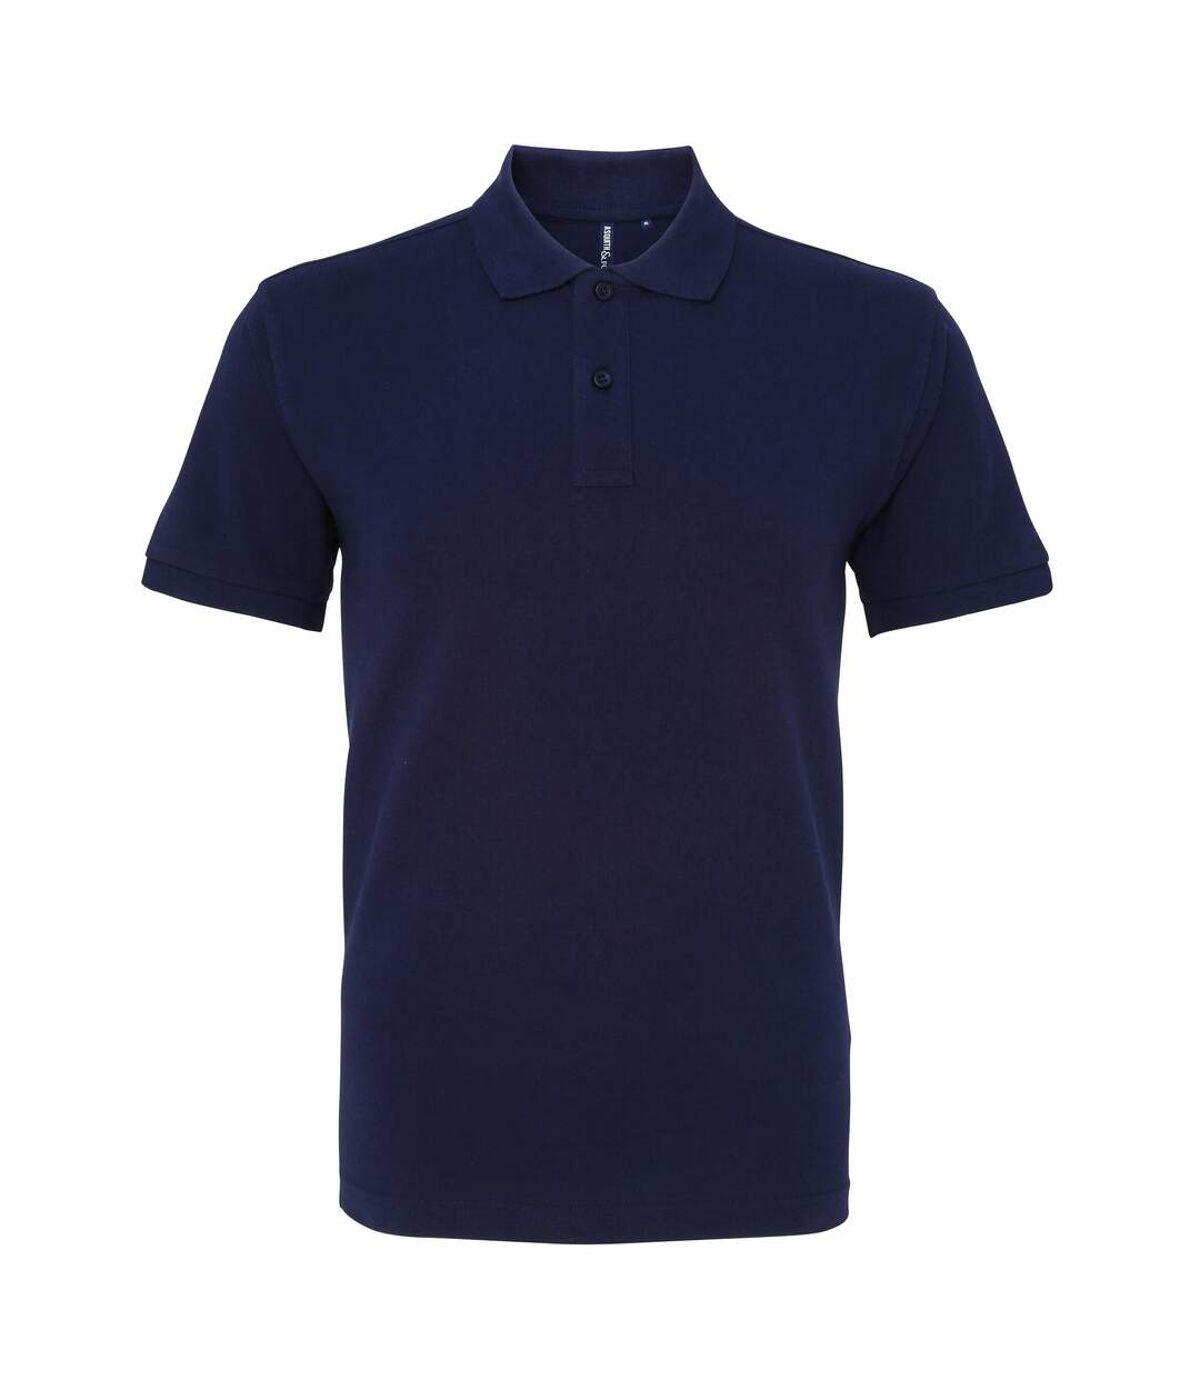 Asquith & Fox - Polo - Homme (Bleu marine) - UTRW7698